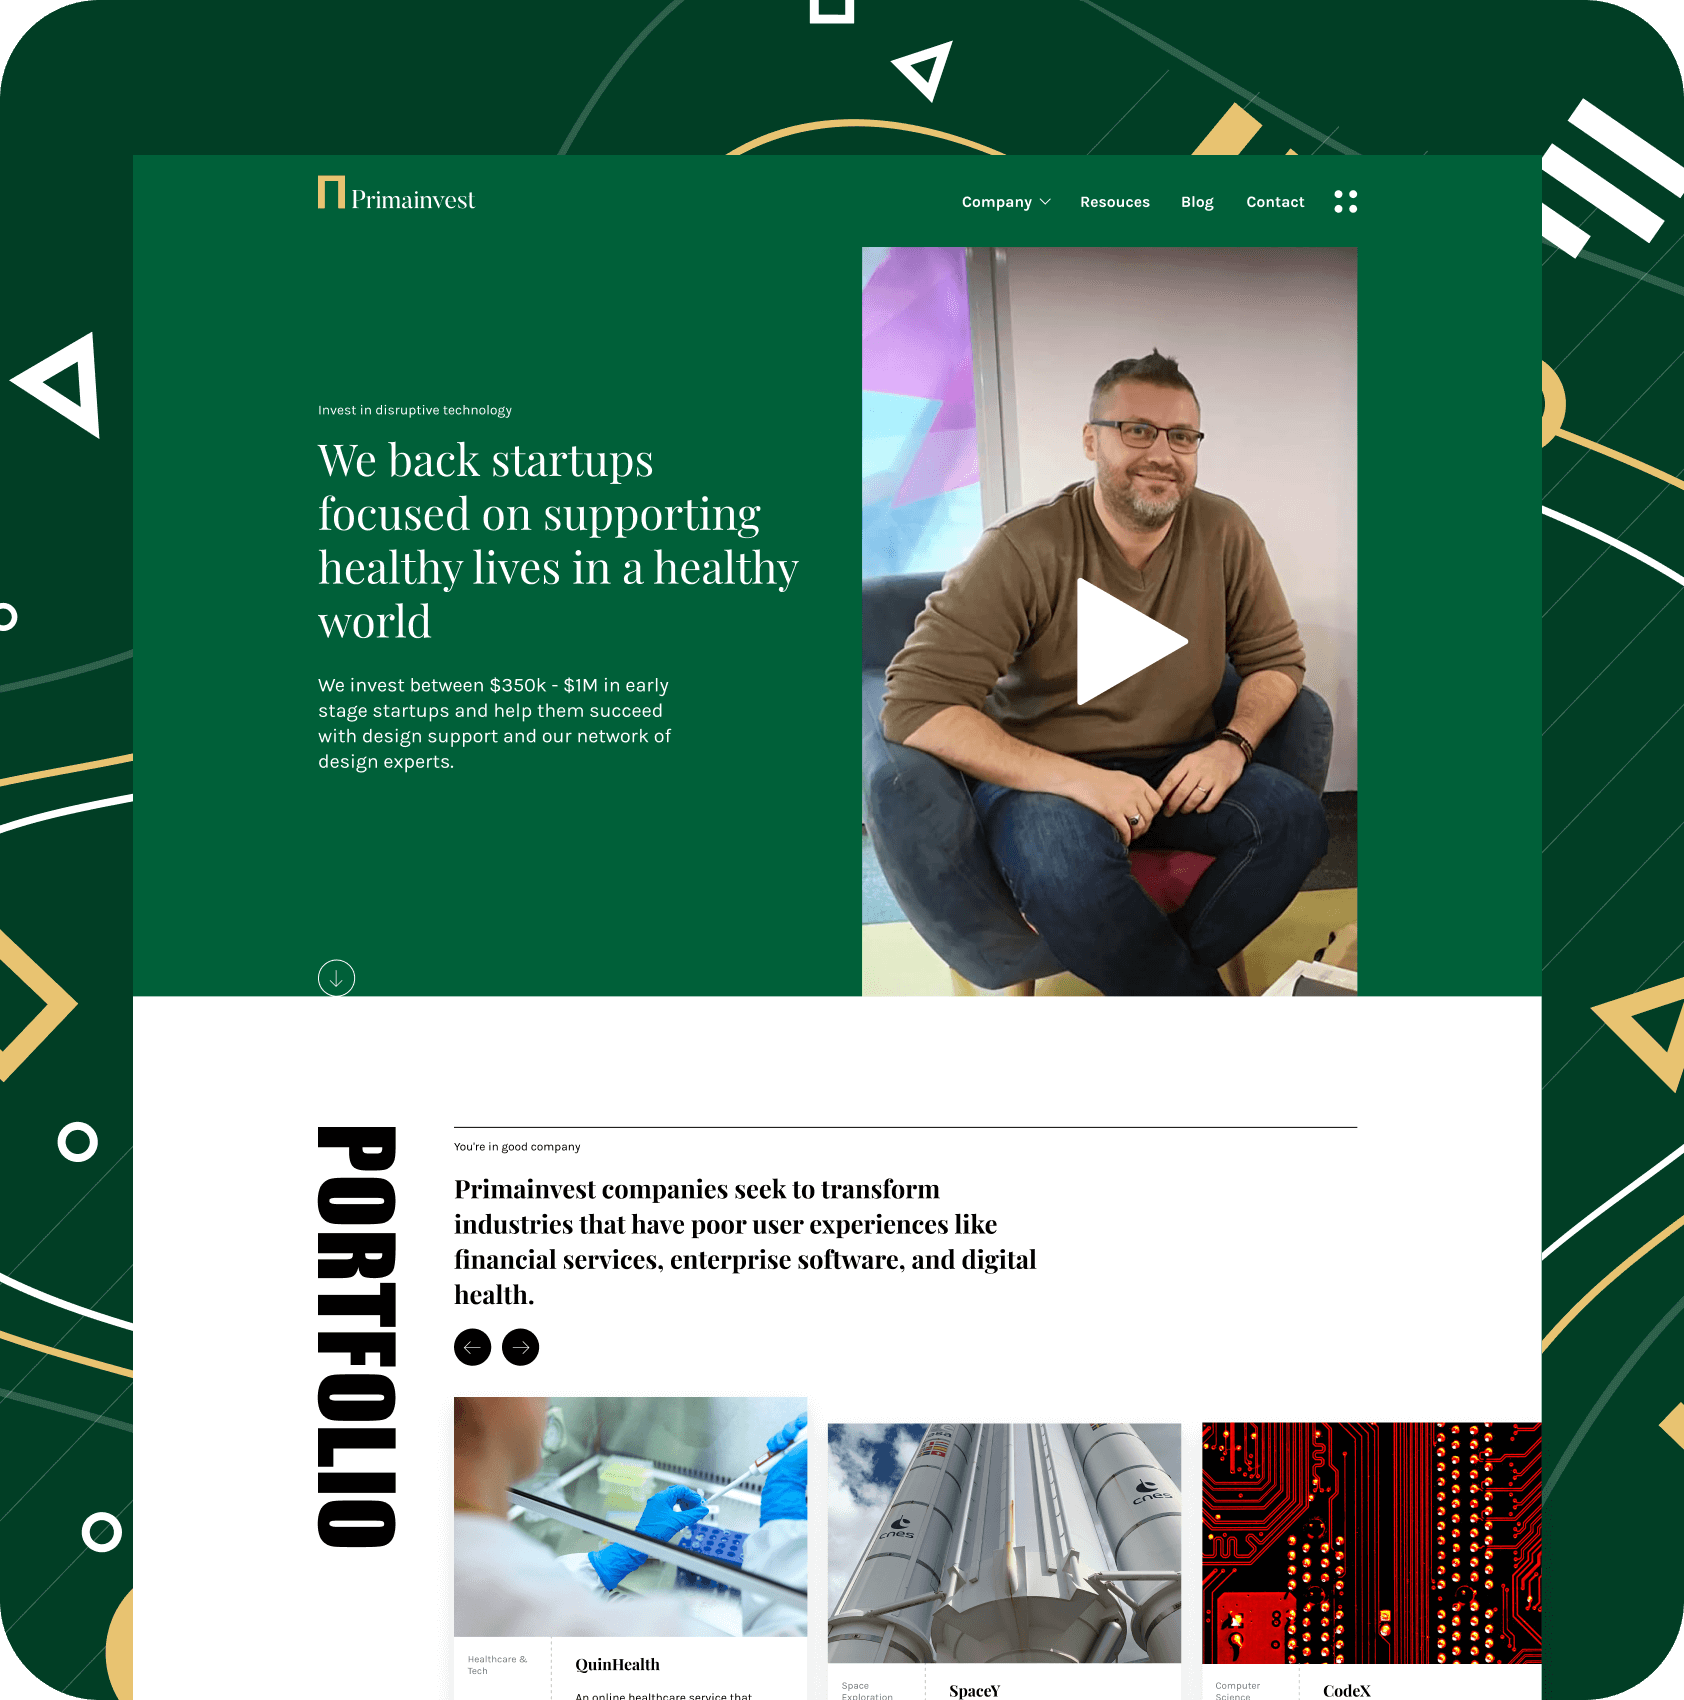 Primainvest website finance, business angel, Romania